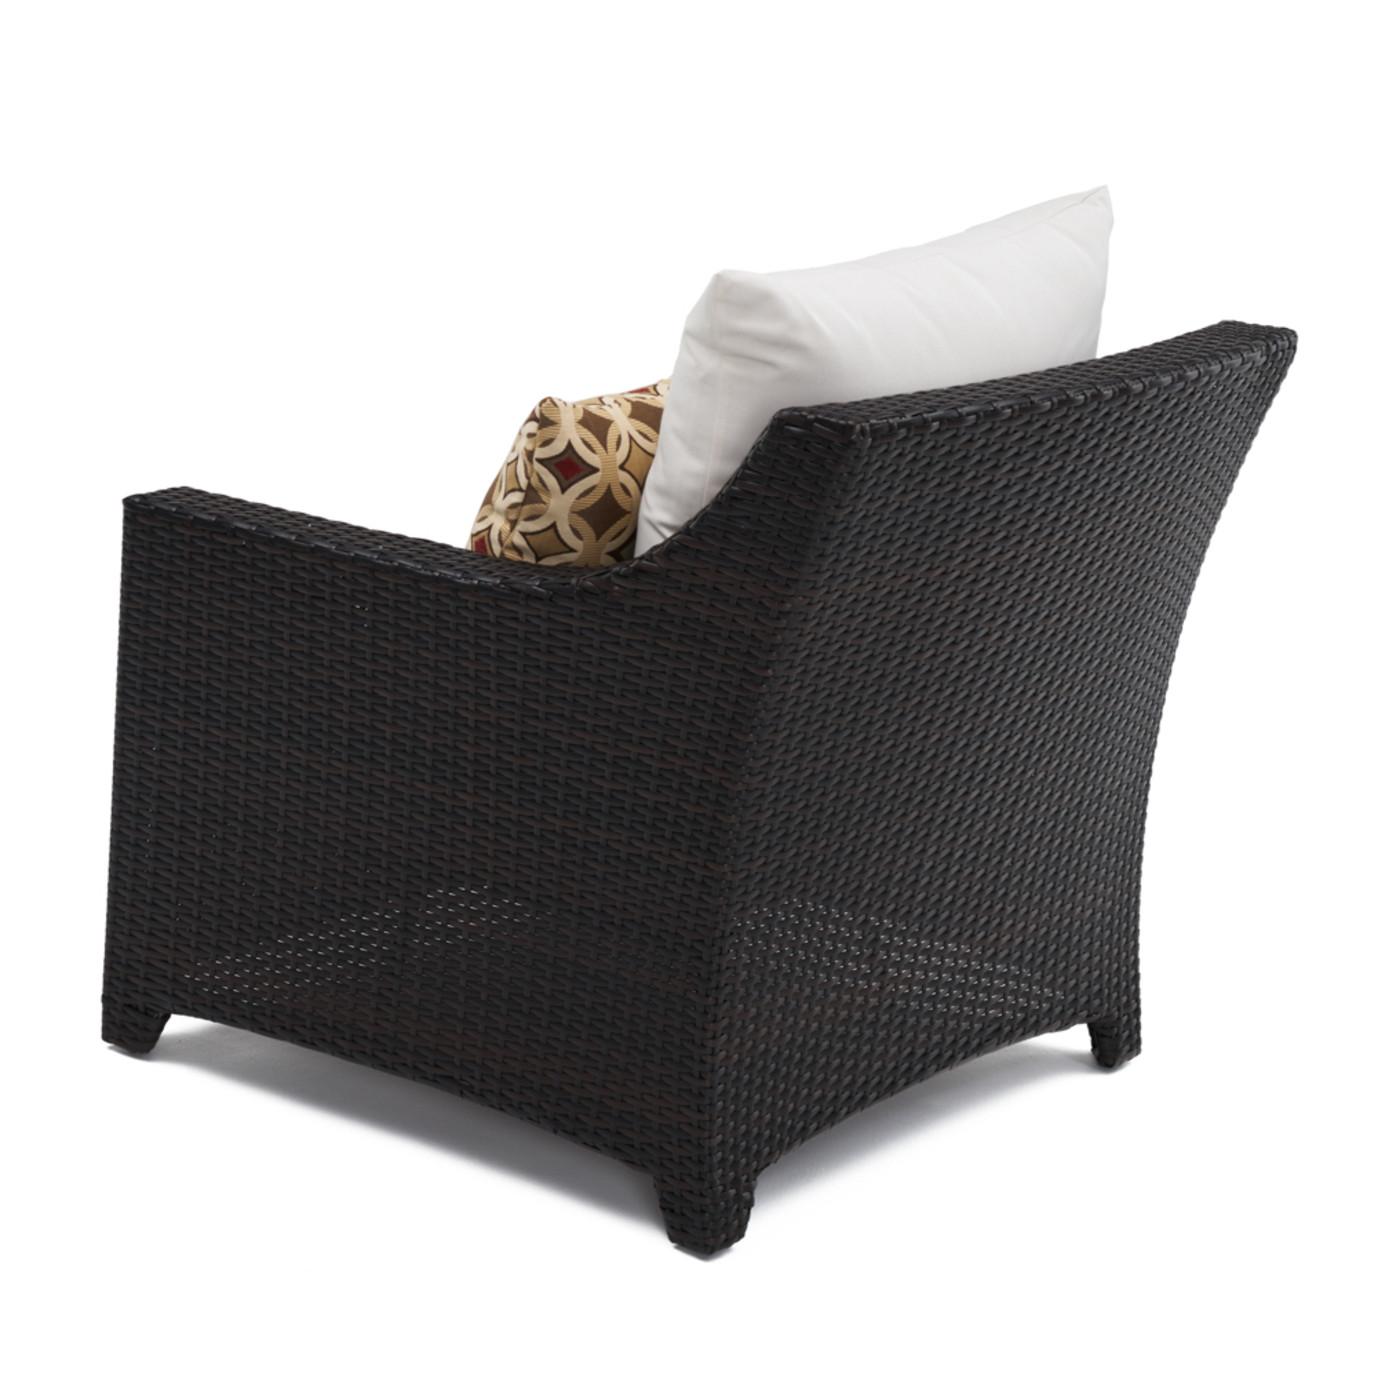 Deco™ 5pc Love and Club Seating Set - Moroccan Cream